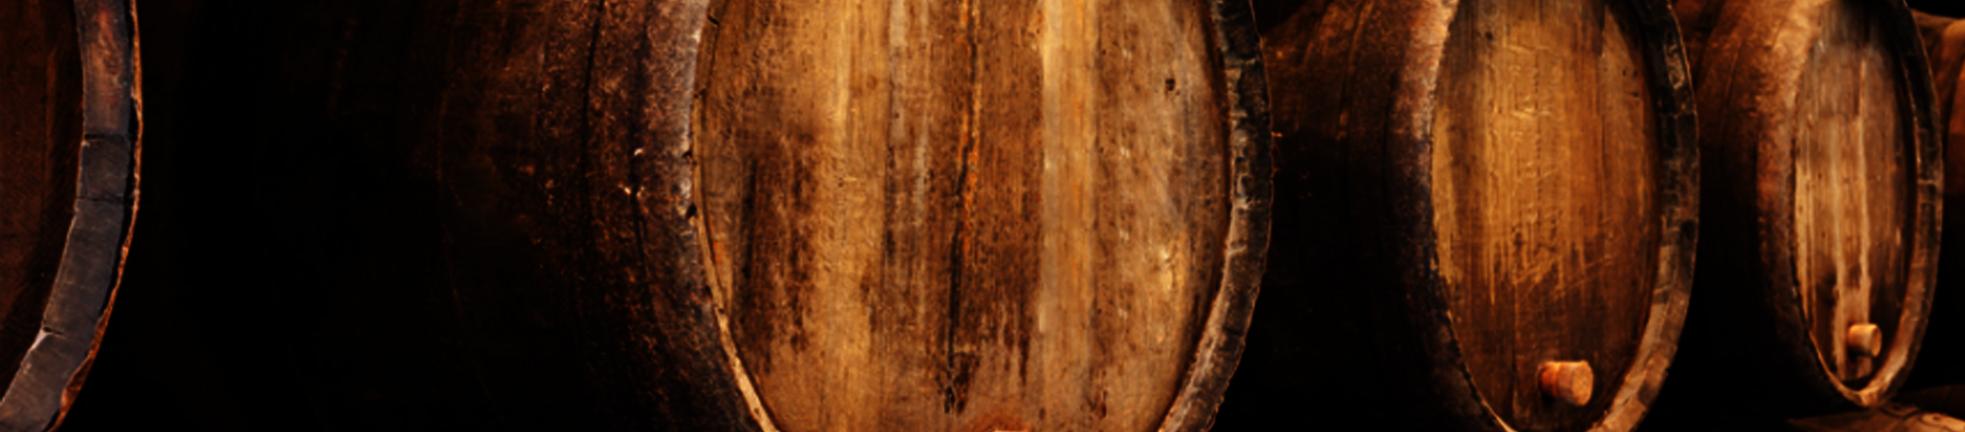 barril madeira